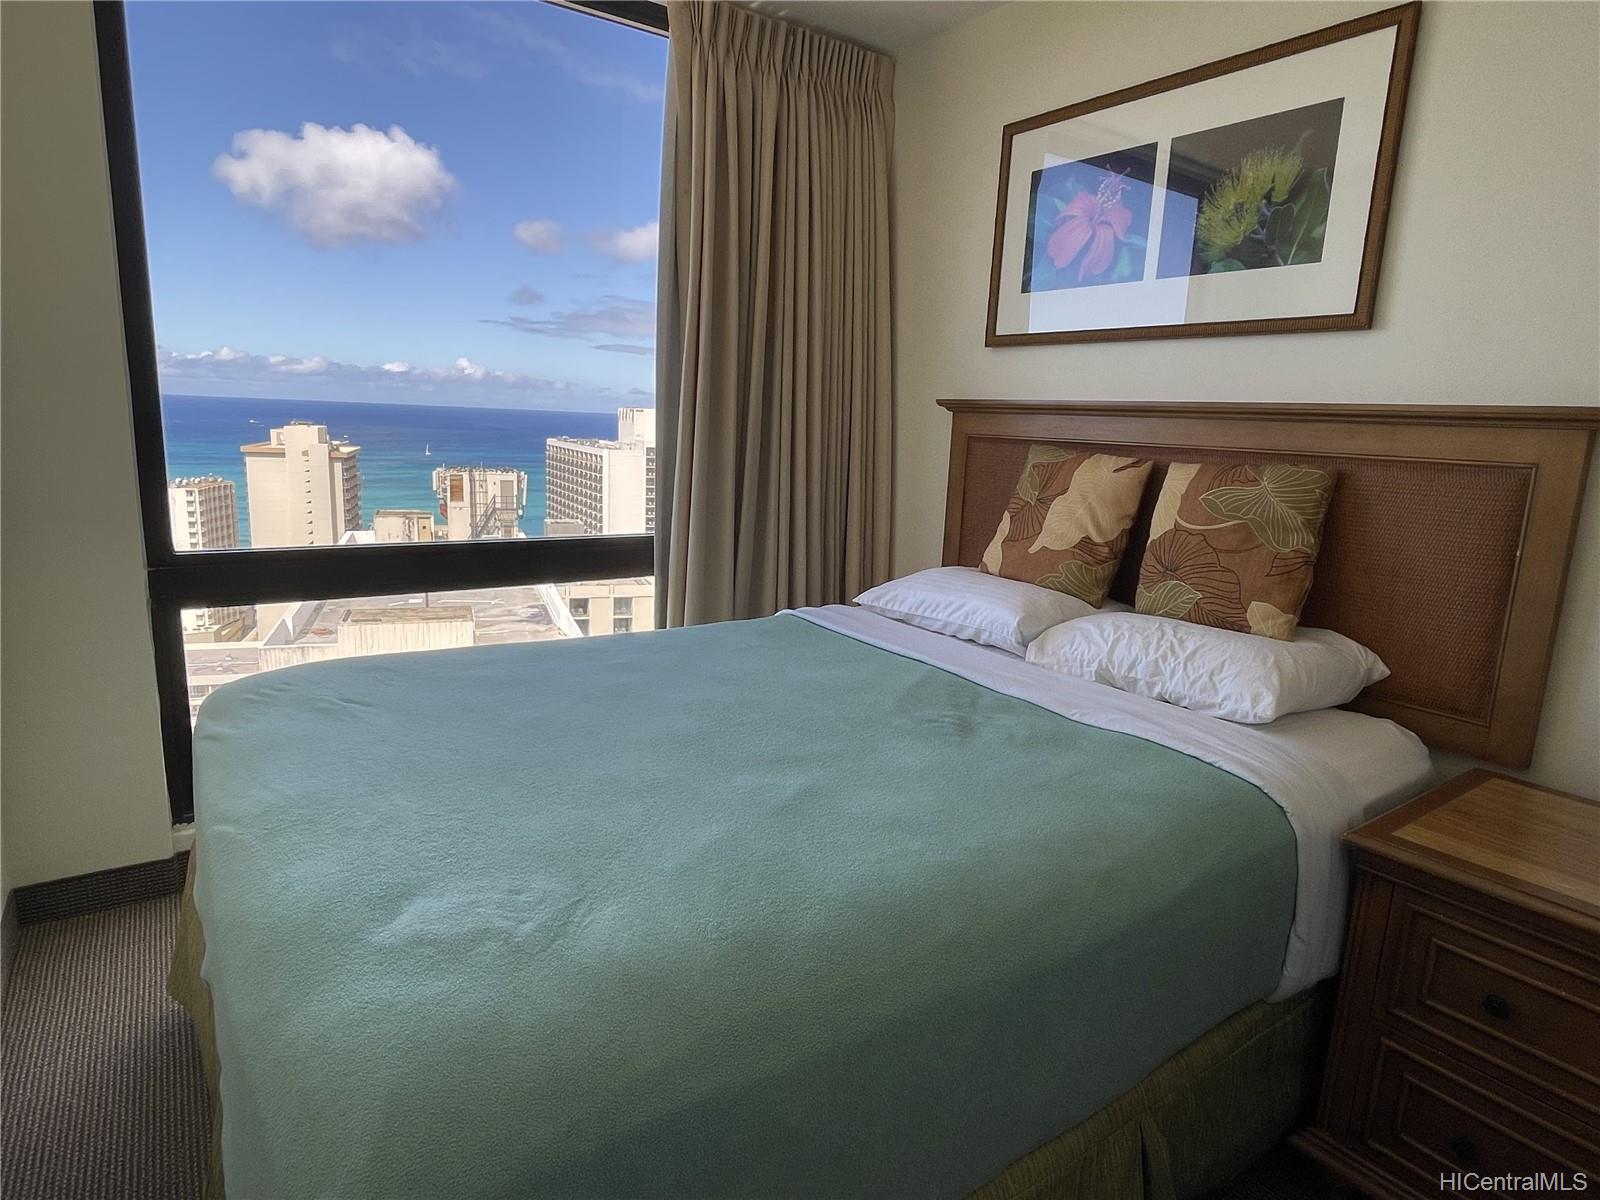 229 Paoakalani Ave Honolulu - Rental - photo 3 of 20